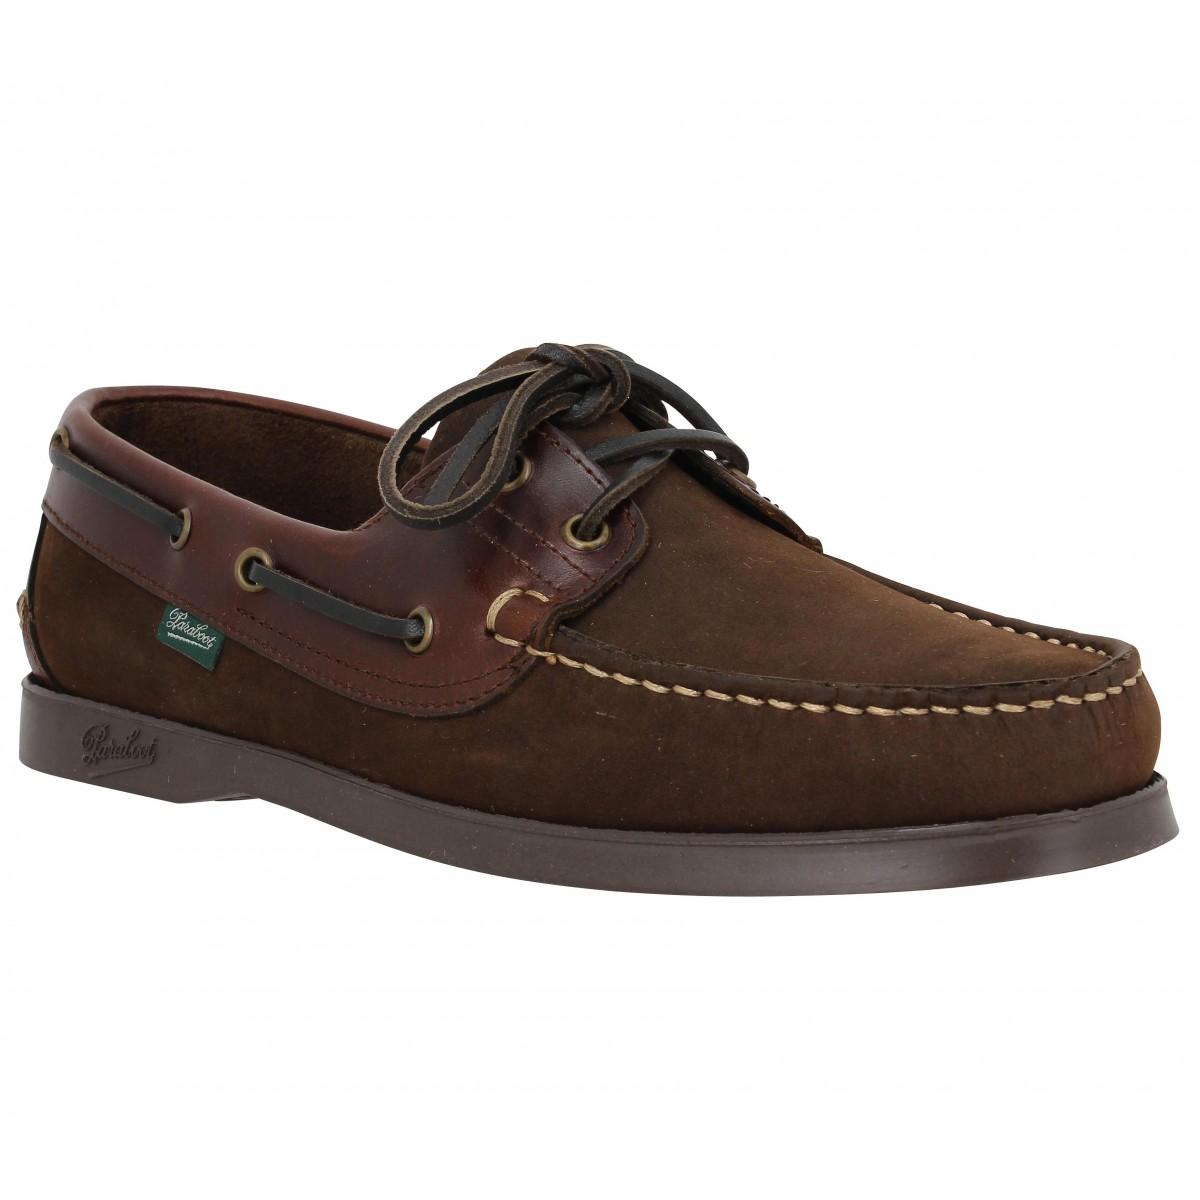 Chaussures bateaux PARABOOT Barth cuir + box gras Homme Gringo + Marron America